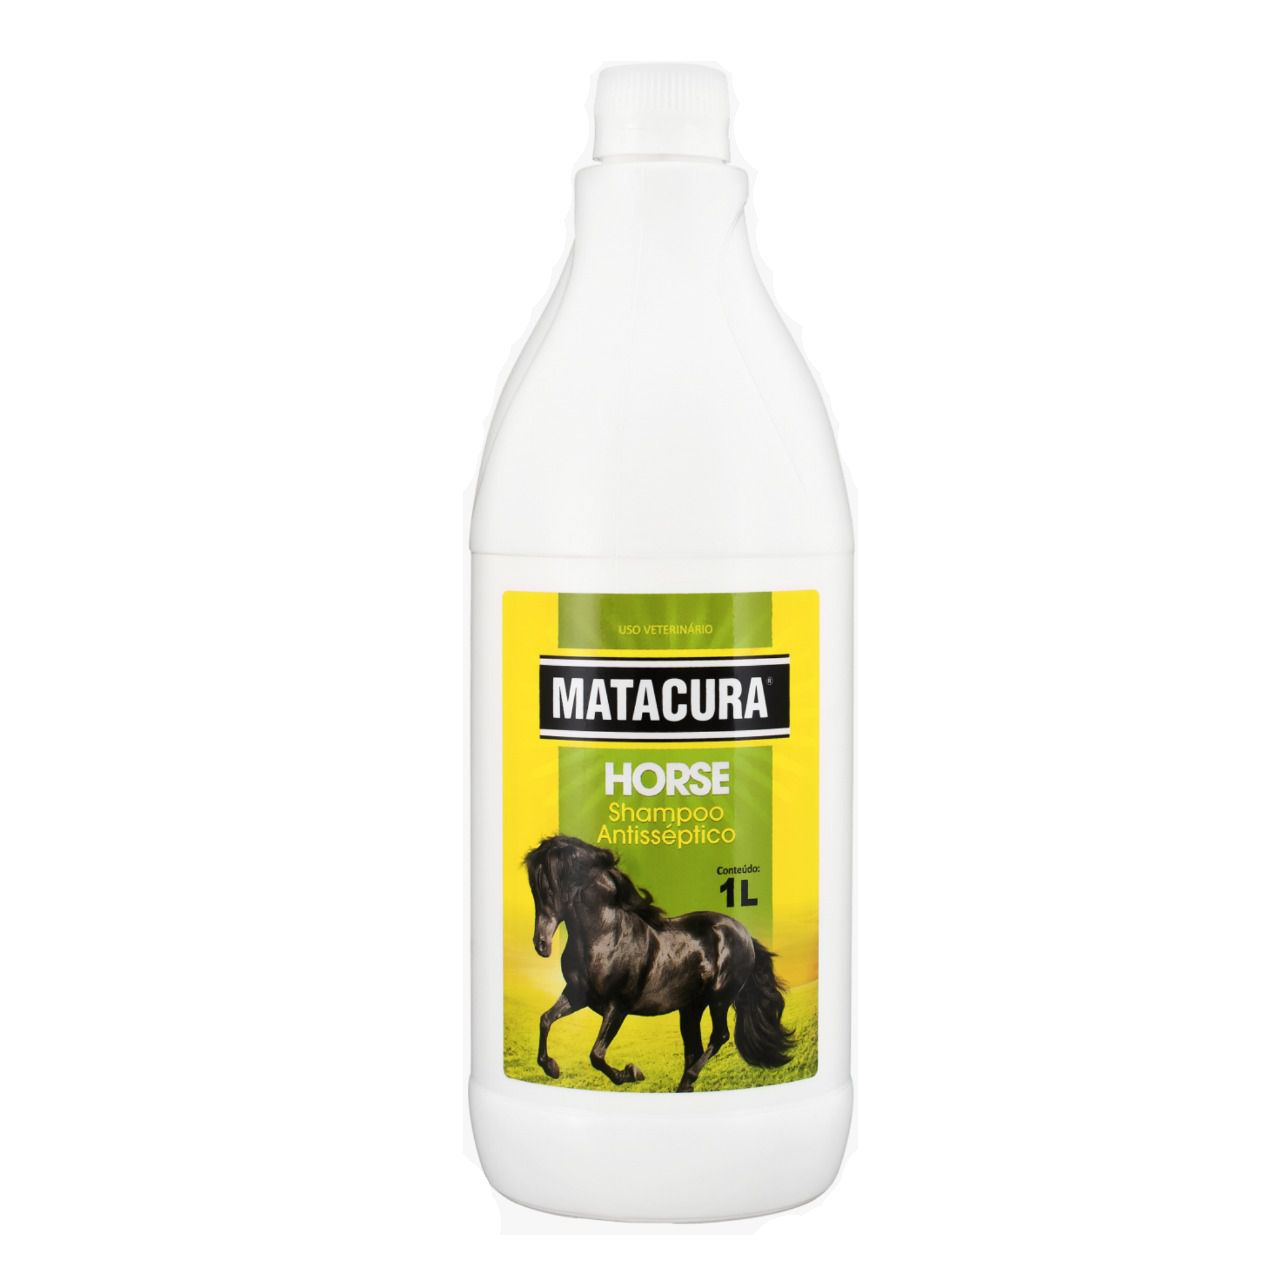 Matacura Shampoo Antisseptico Horse 1l